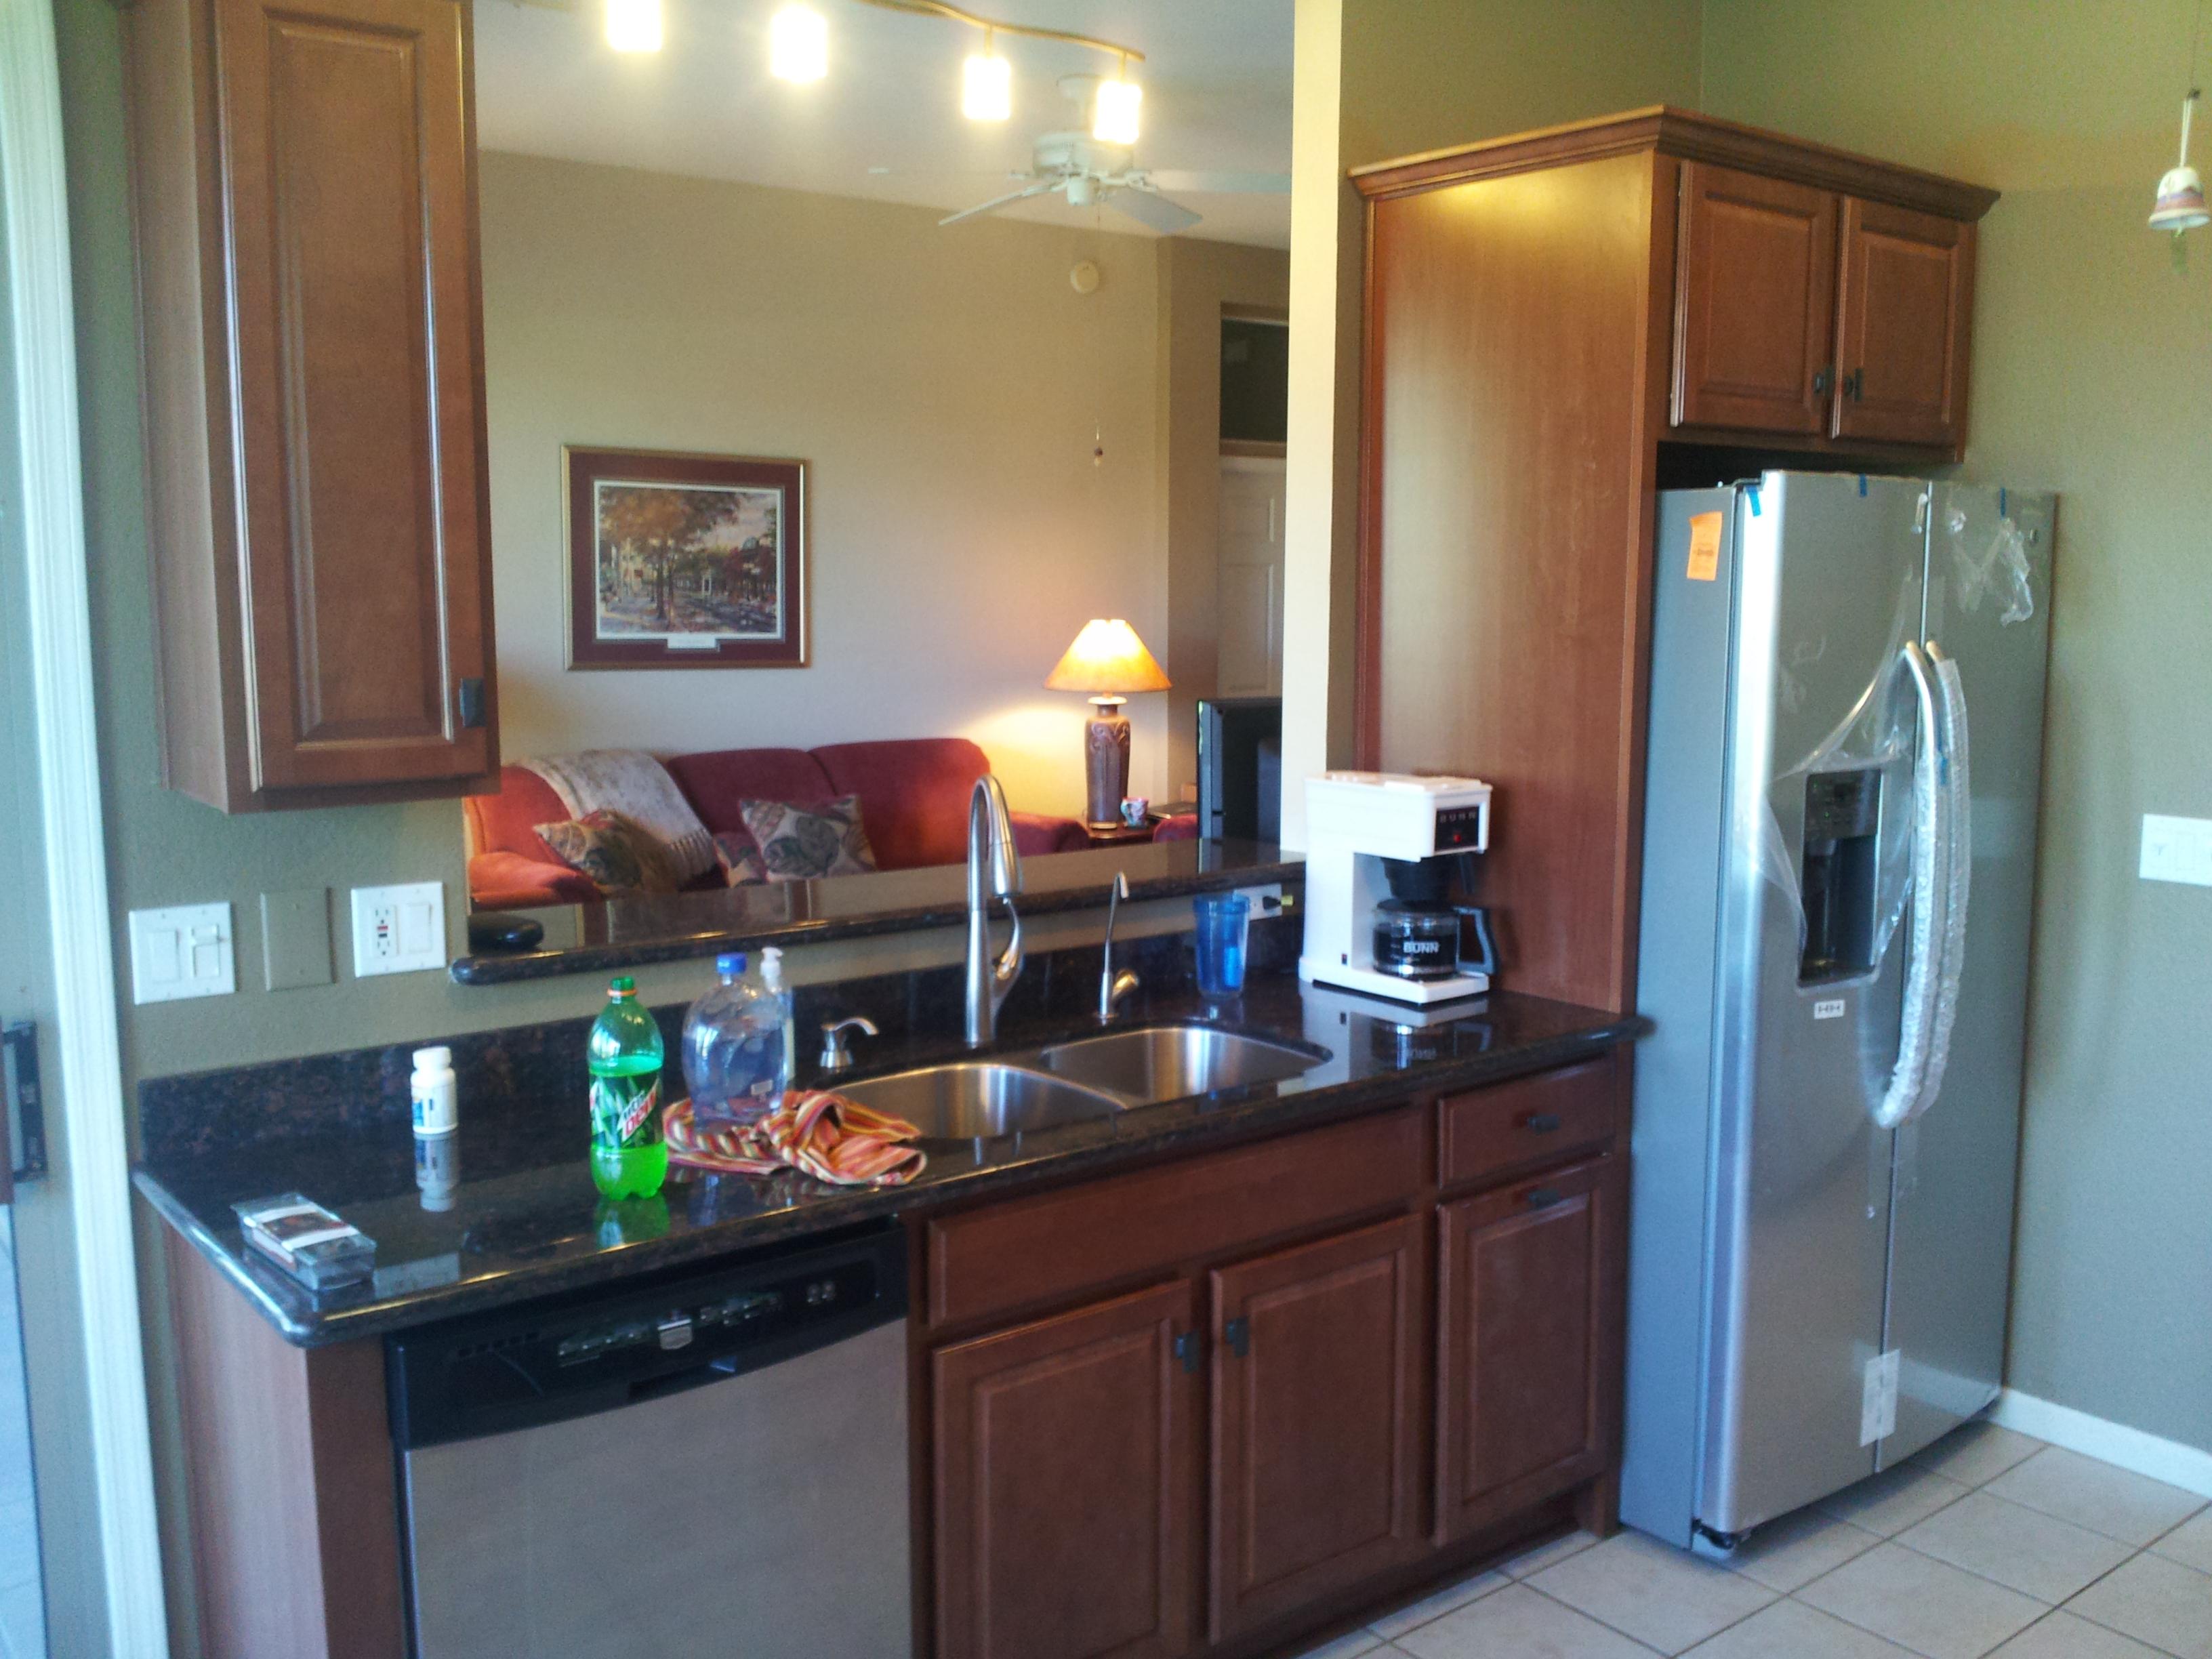 cabinets kitchen remodeling phoenix az Phoenix Kitchen remodeled